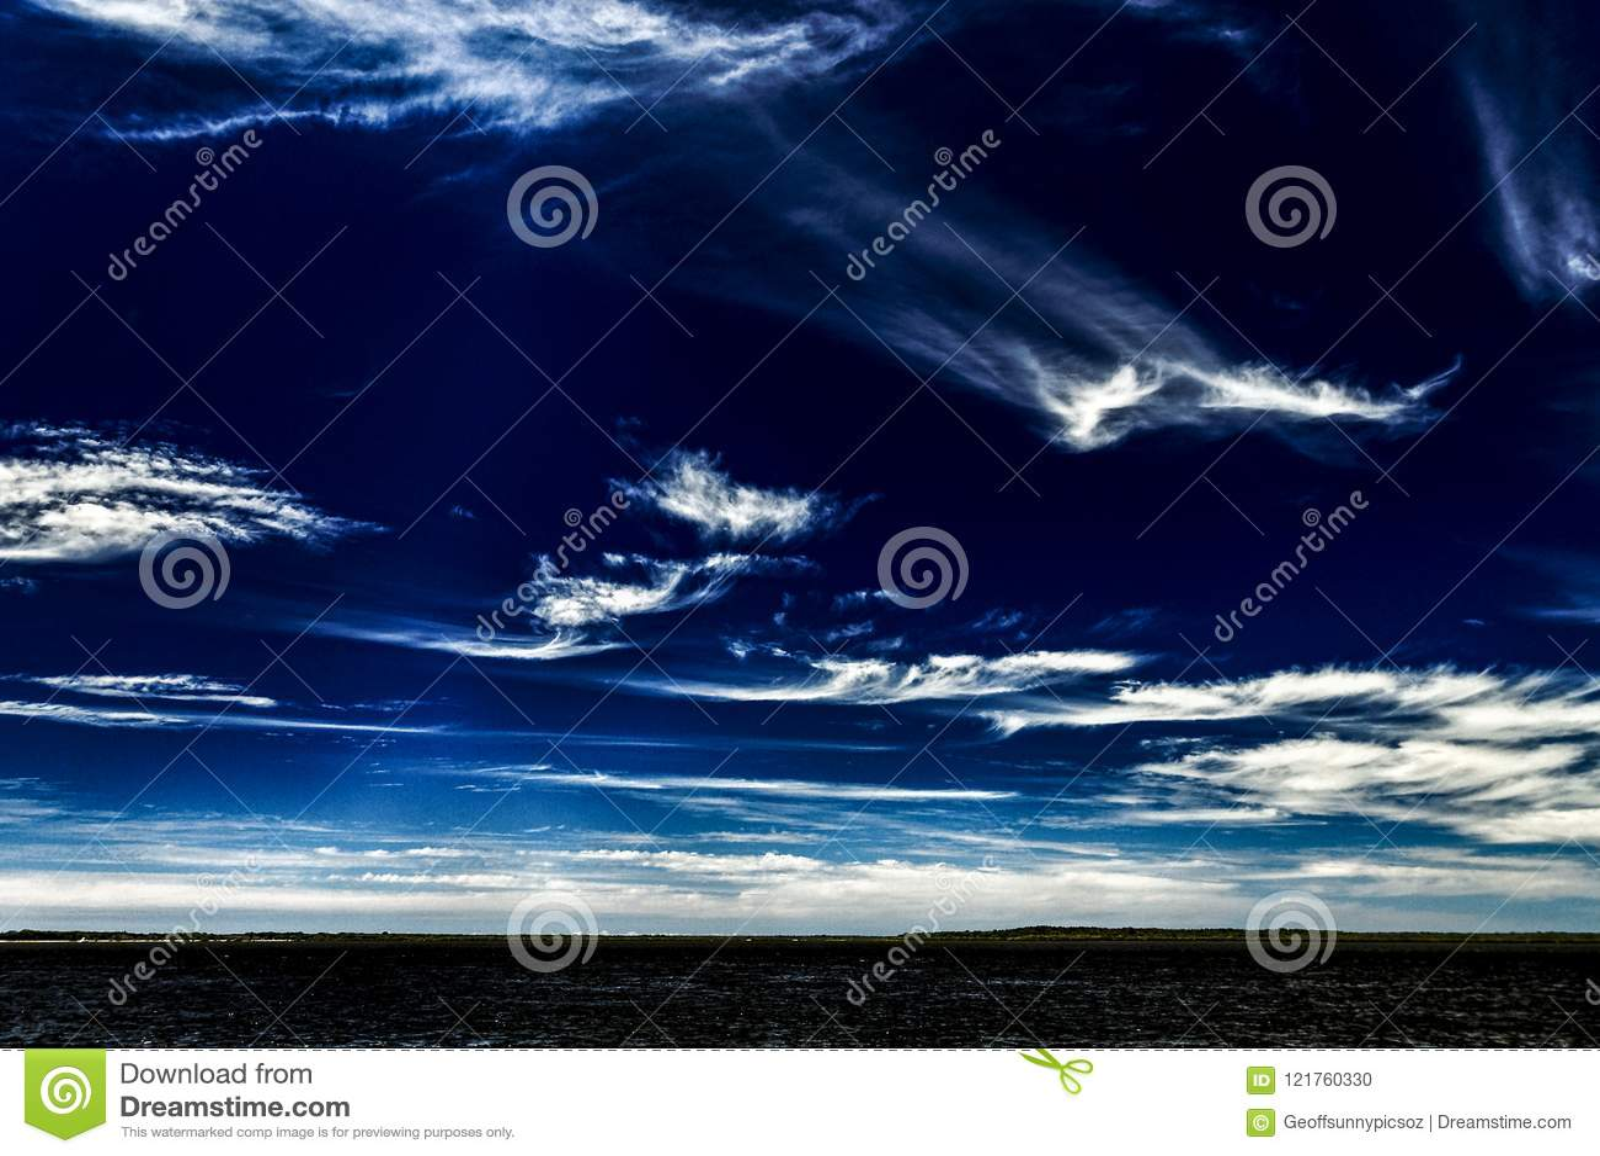 Vivid white Cirrus cloud in dark blue sky.